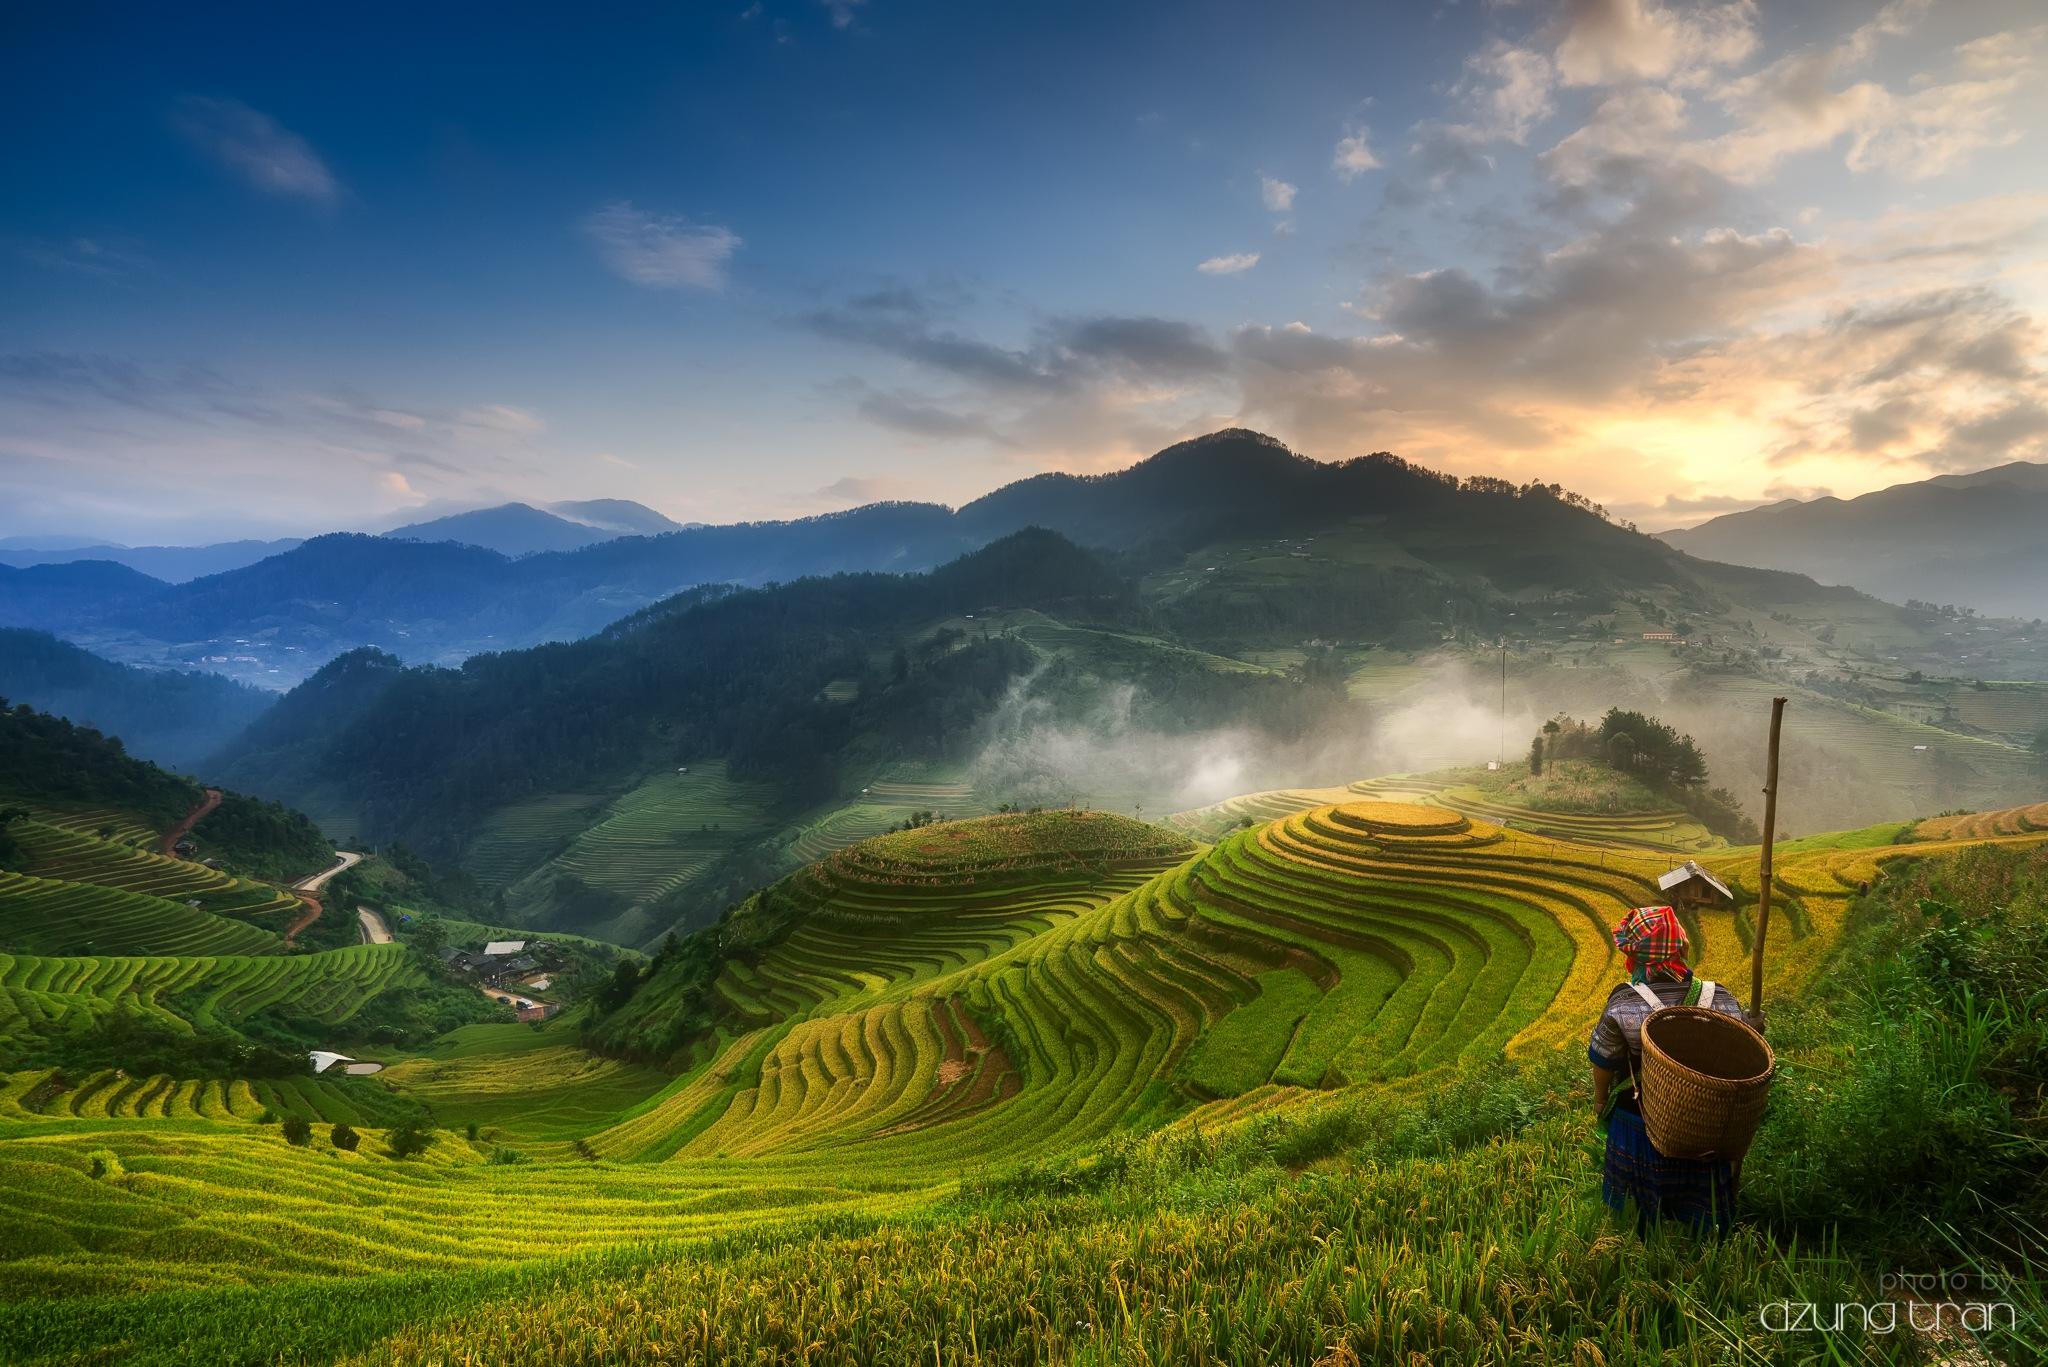 Mu Cang Chai Rice Terraces by Dzung Tran